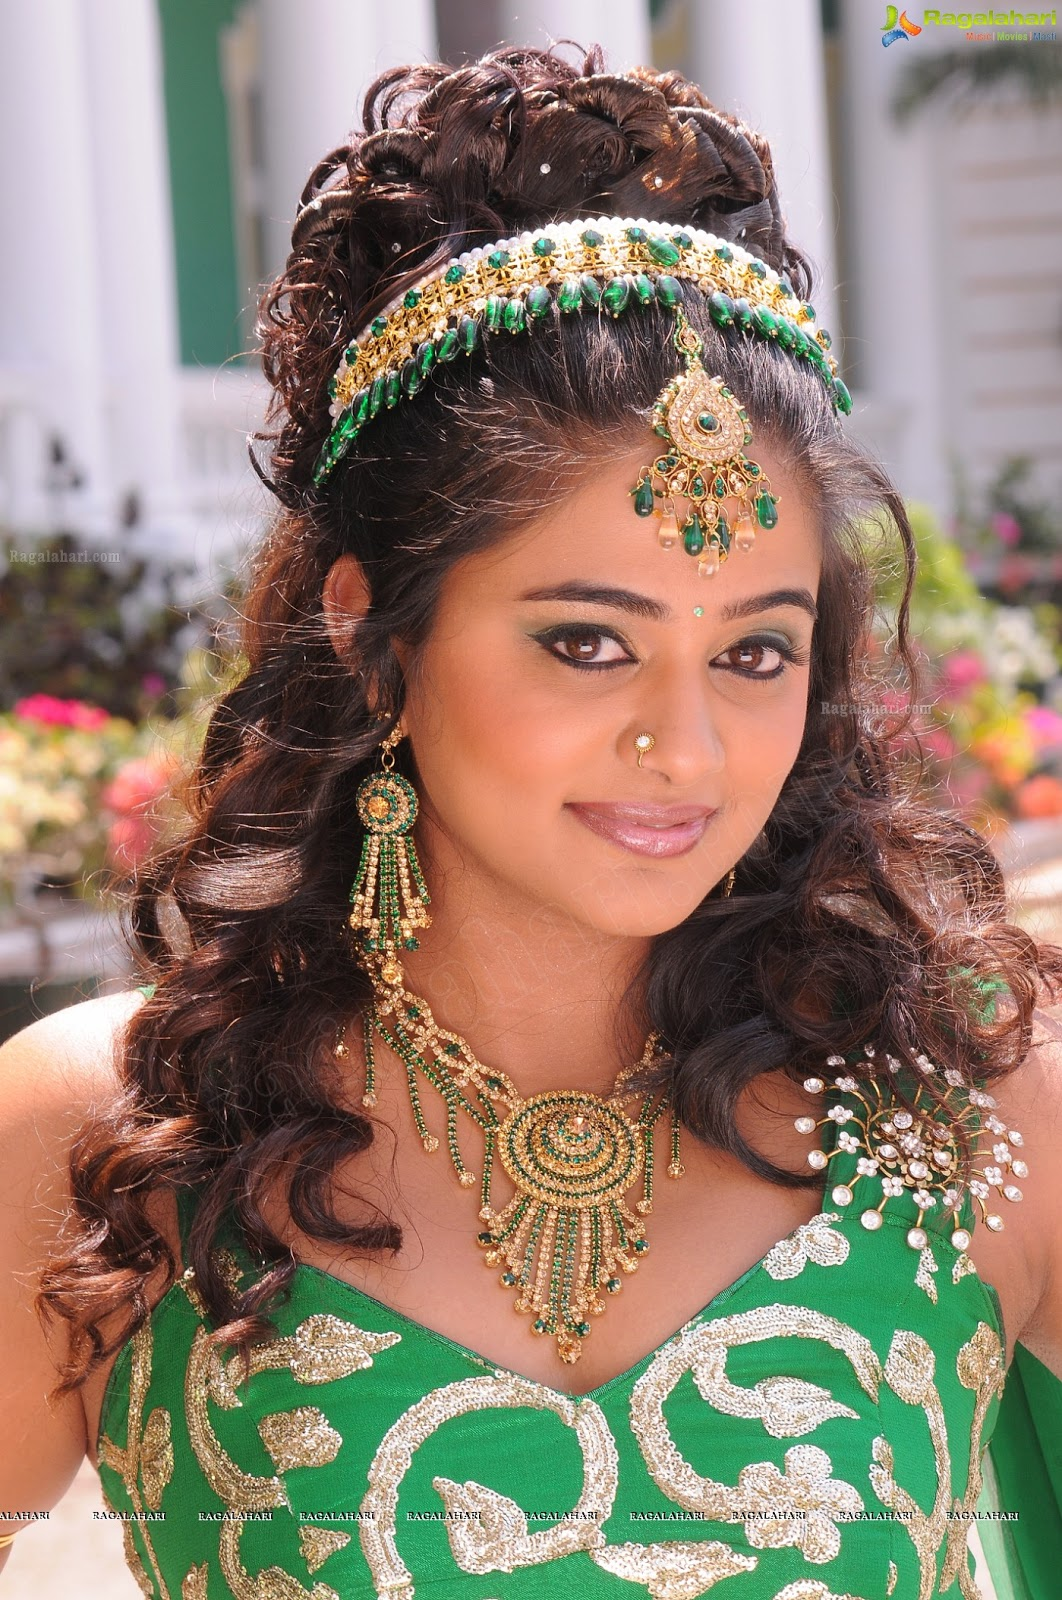 my country actress priyamani spicy posters kshetram